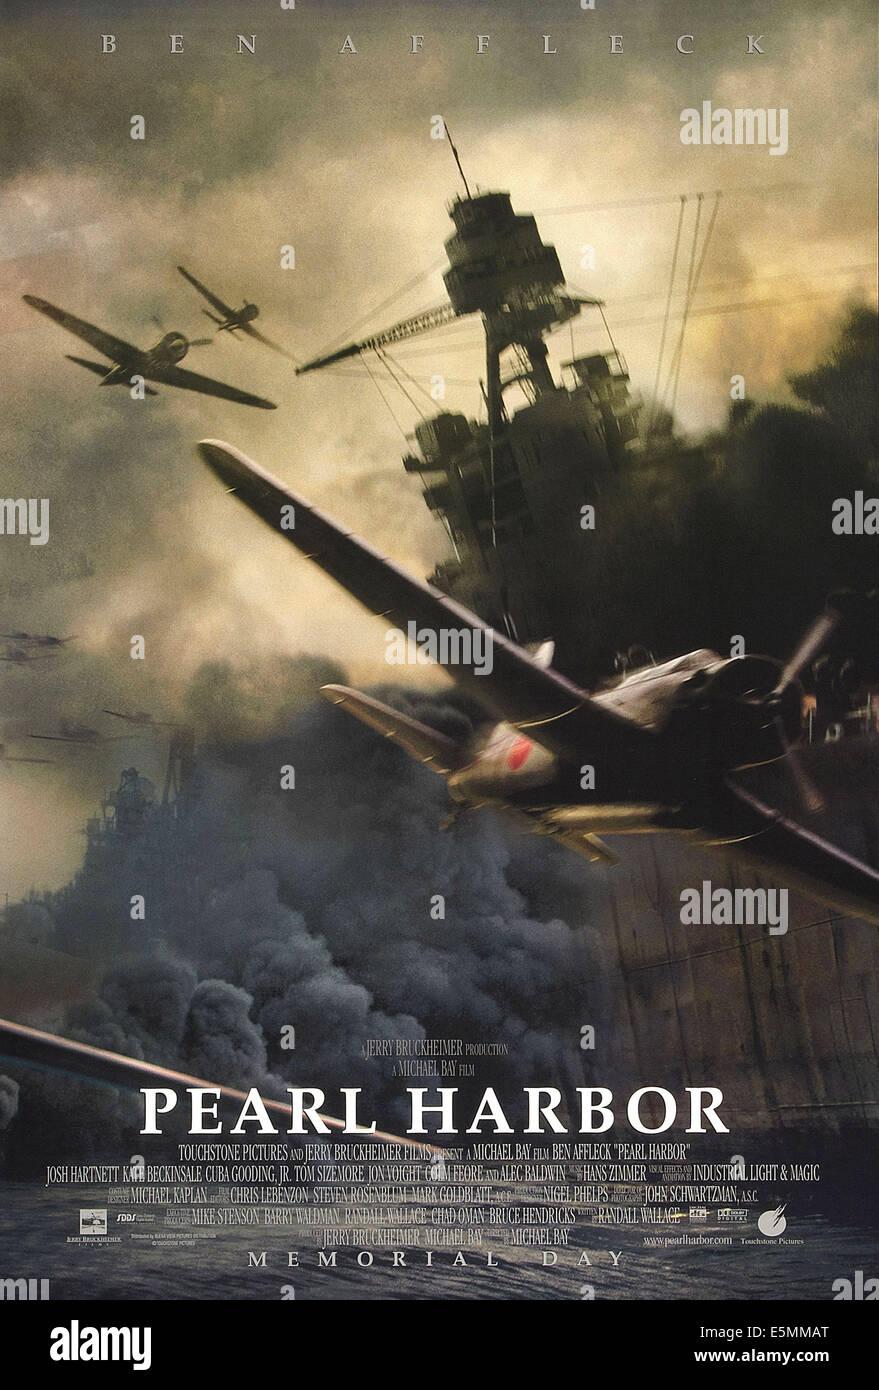 PEARL HARBOR, US poster art, 2001. - Stock Image